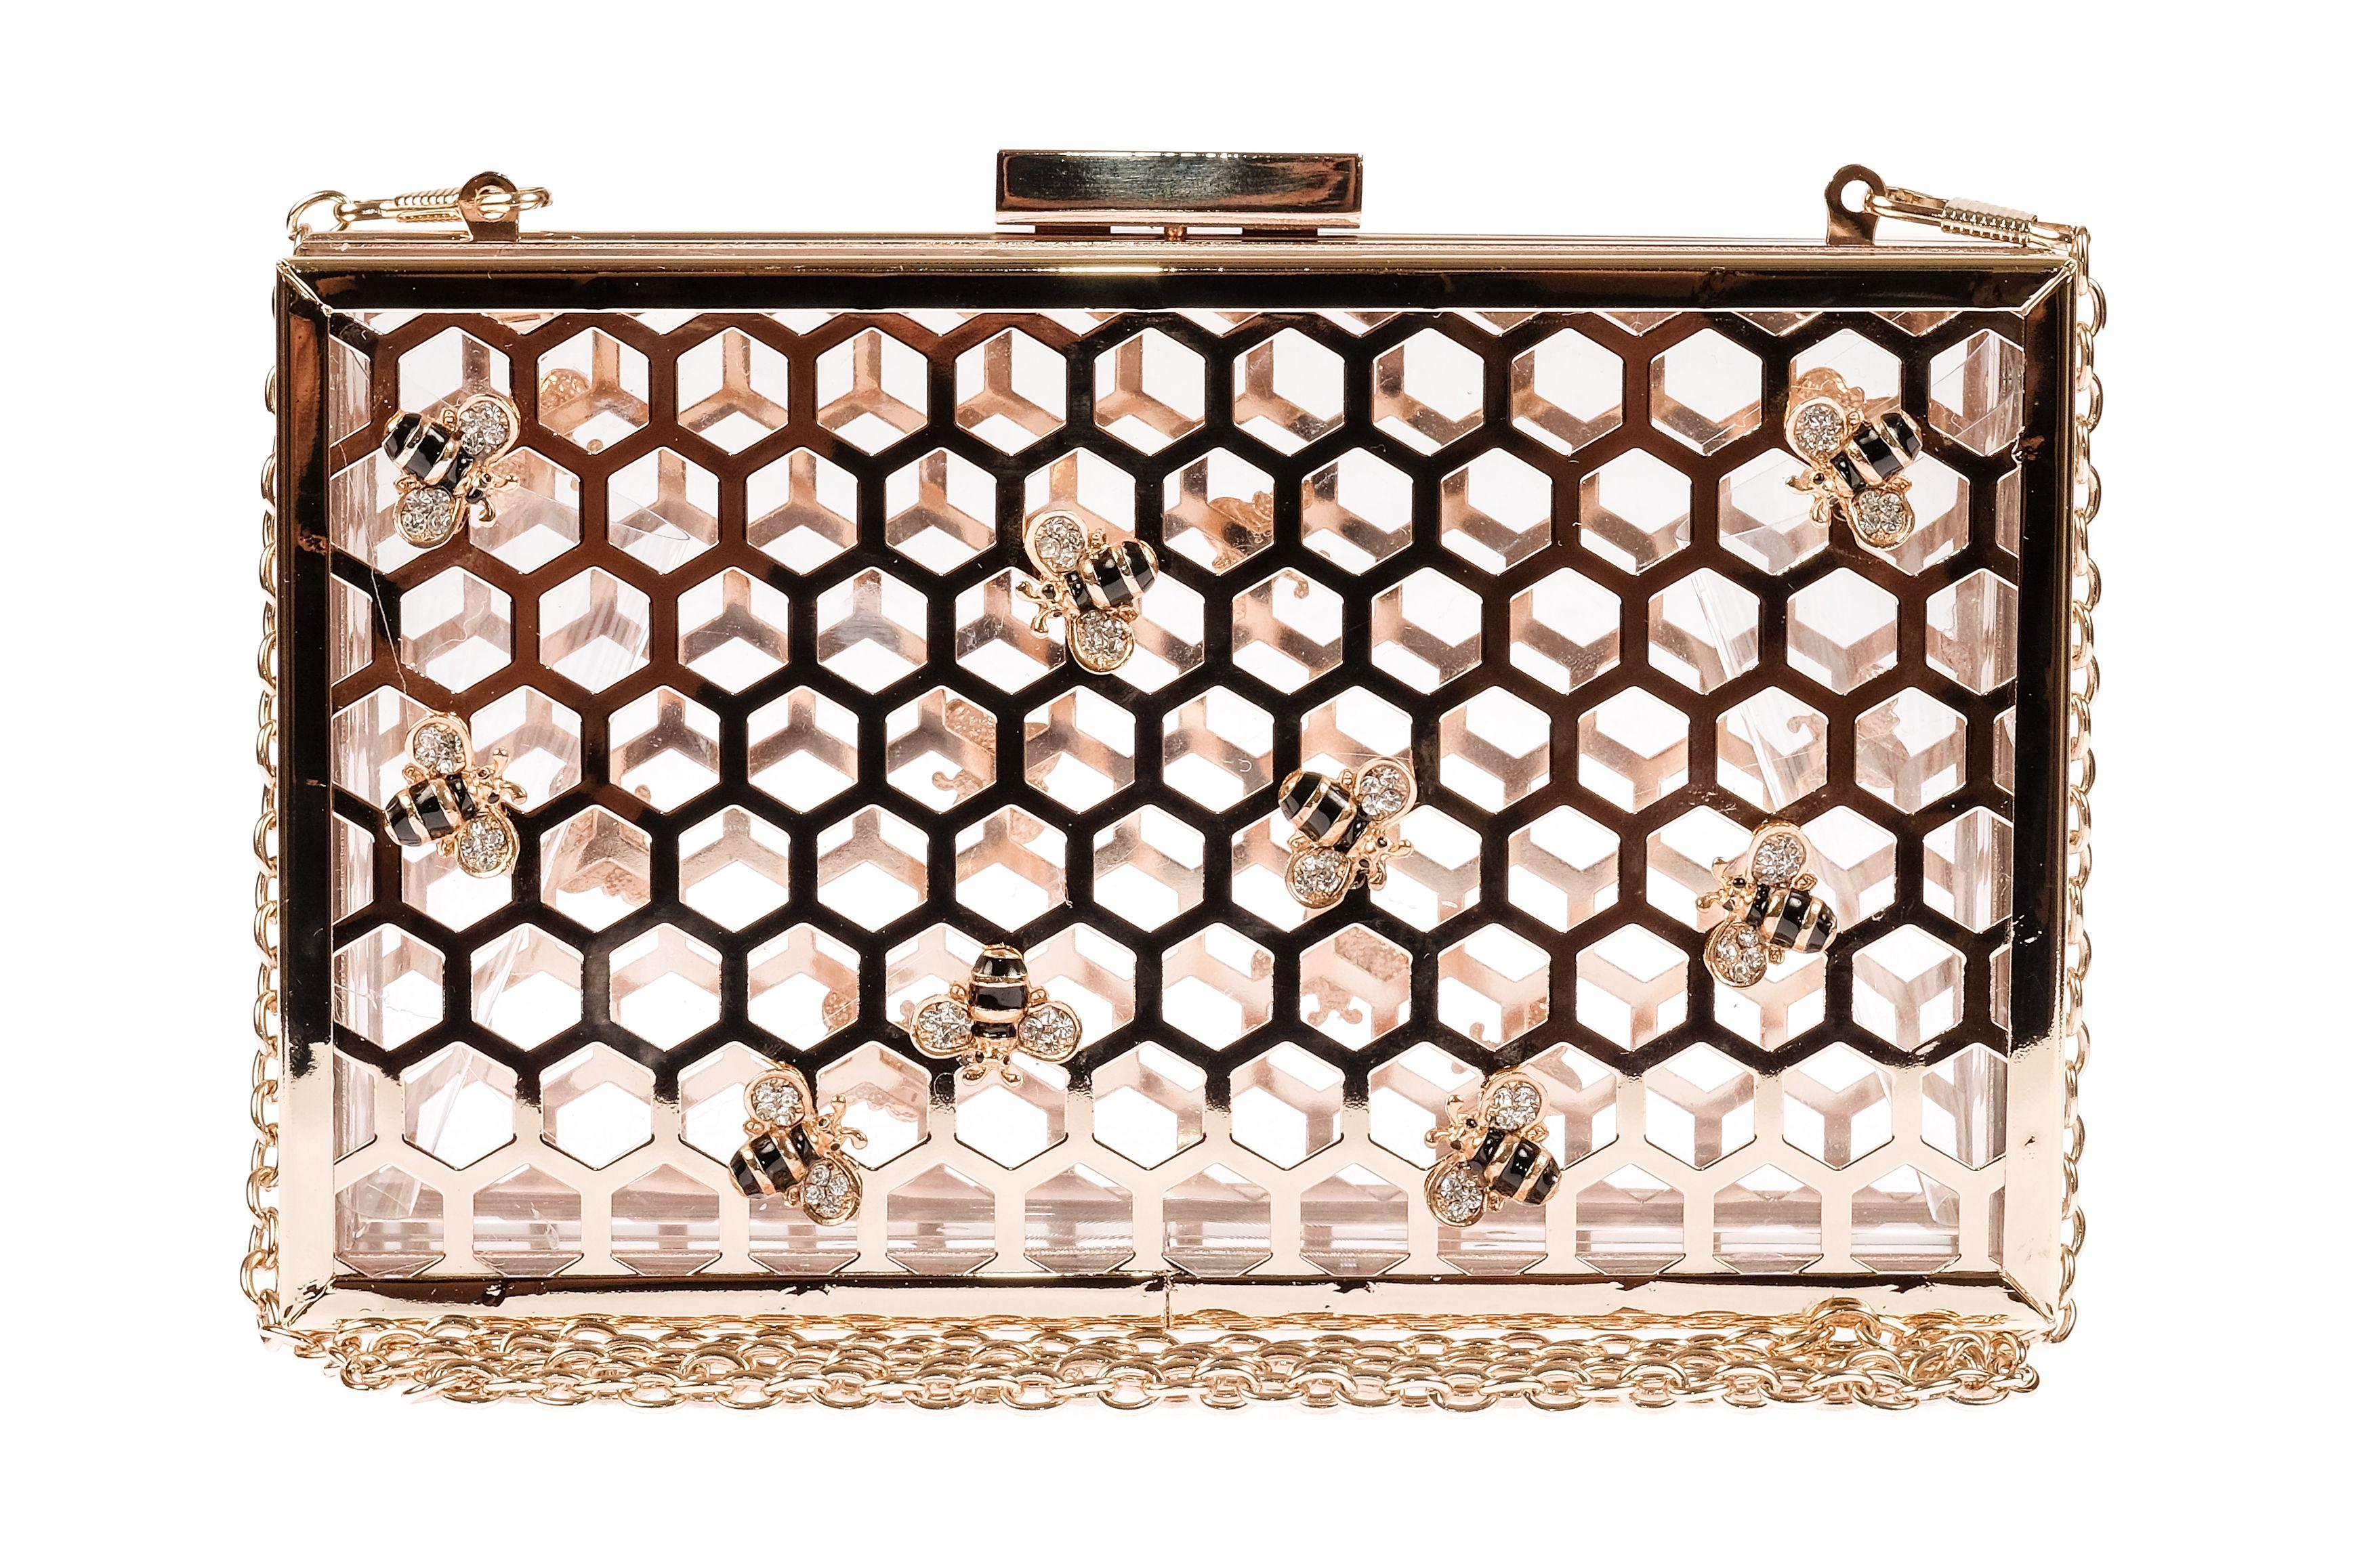 Skinnydip London Bee Clutch Bag  #skinnydip #skinnydiplondon #clutch #bag #fashion www.skinnydiplondon.com